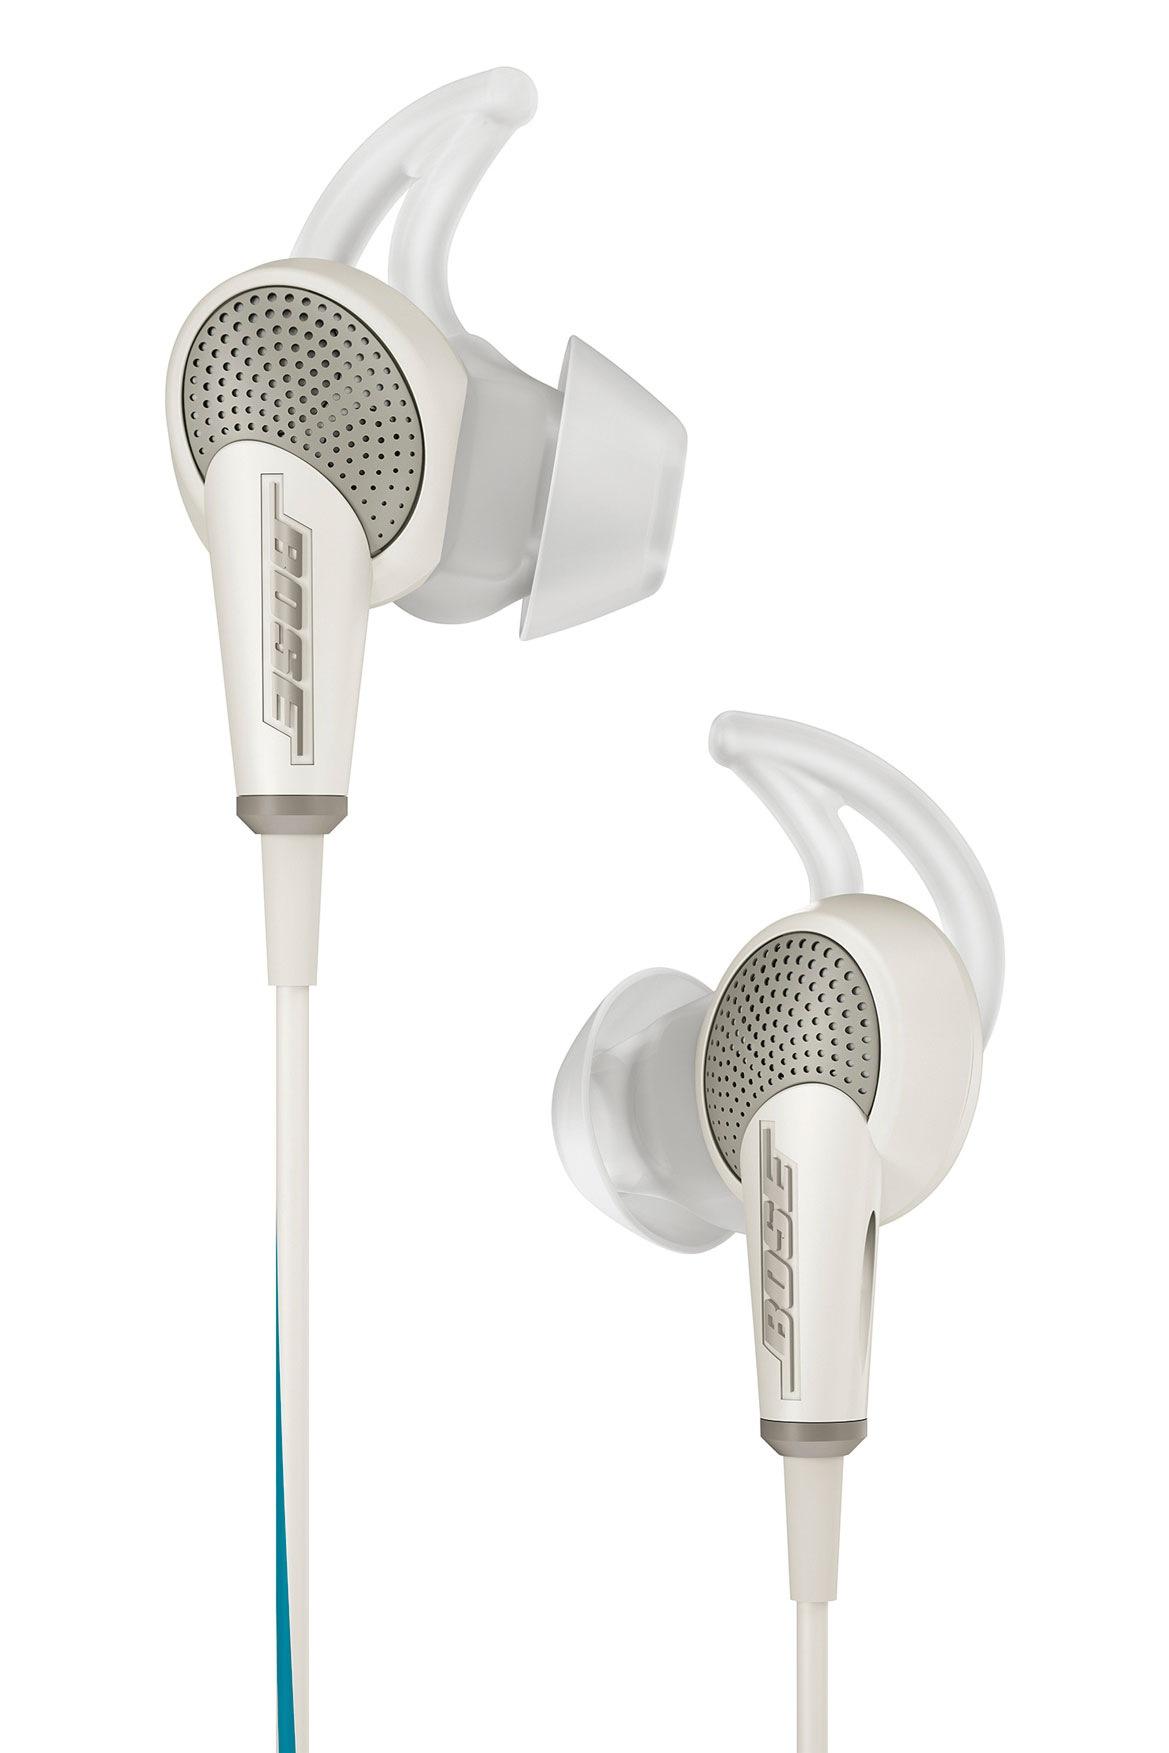 Bose Headset Plug Wiring Electrical Diagrams Diagram Earbud Scenhiser